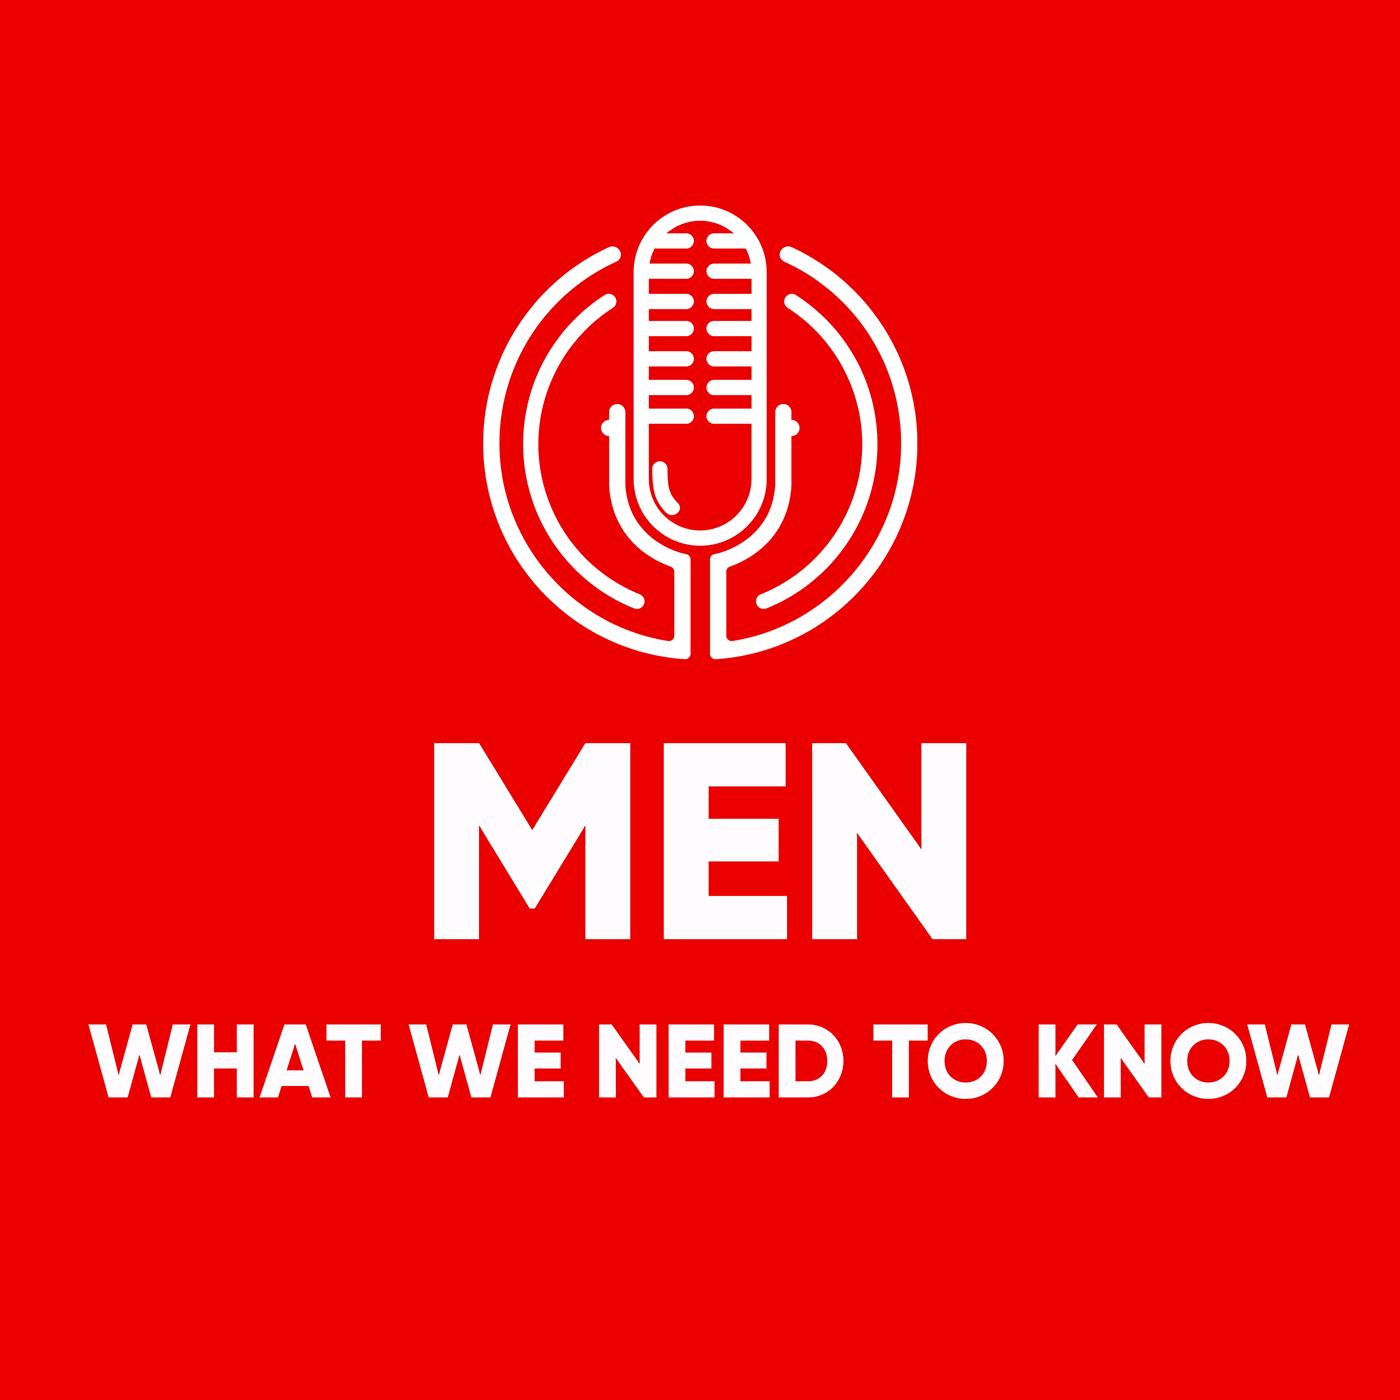 008: Four Tips for Men When Talking to Women show art